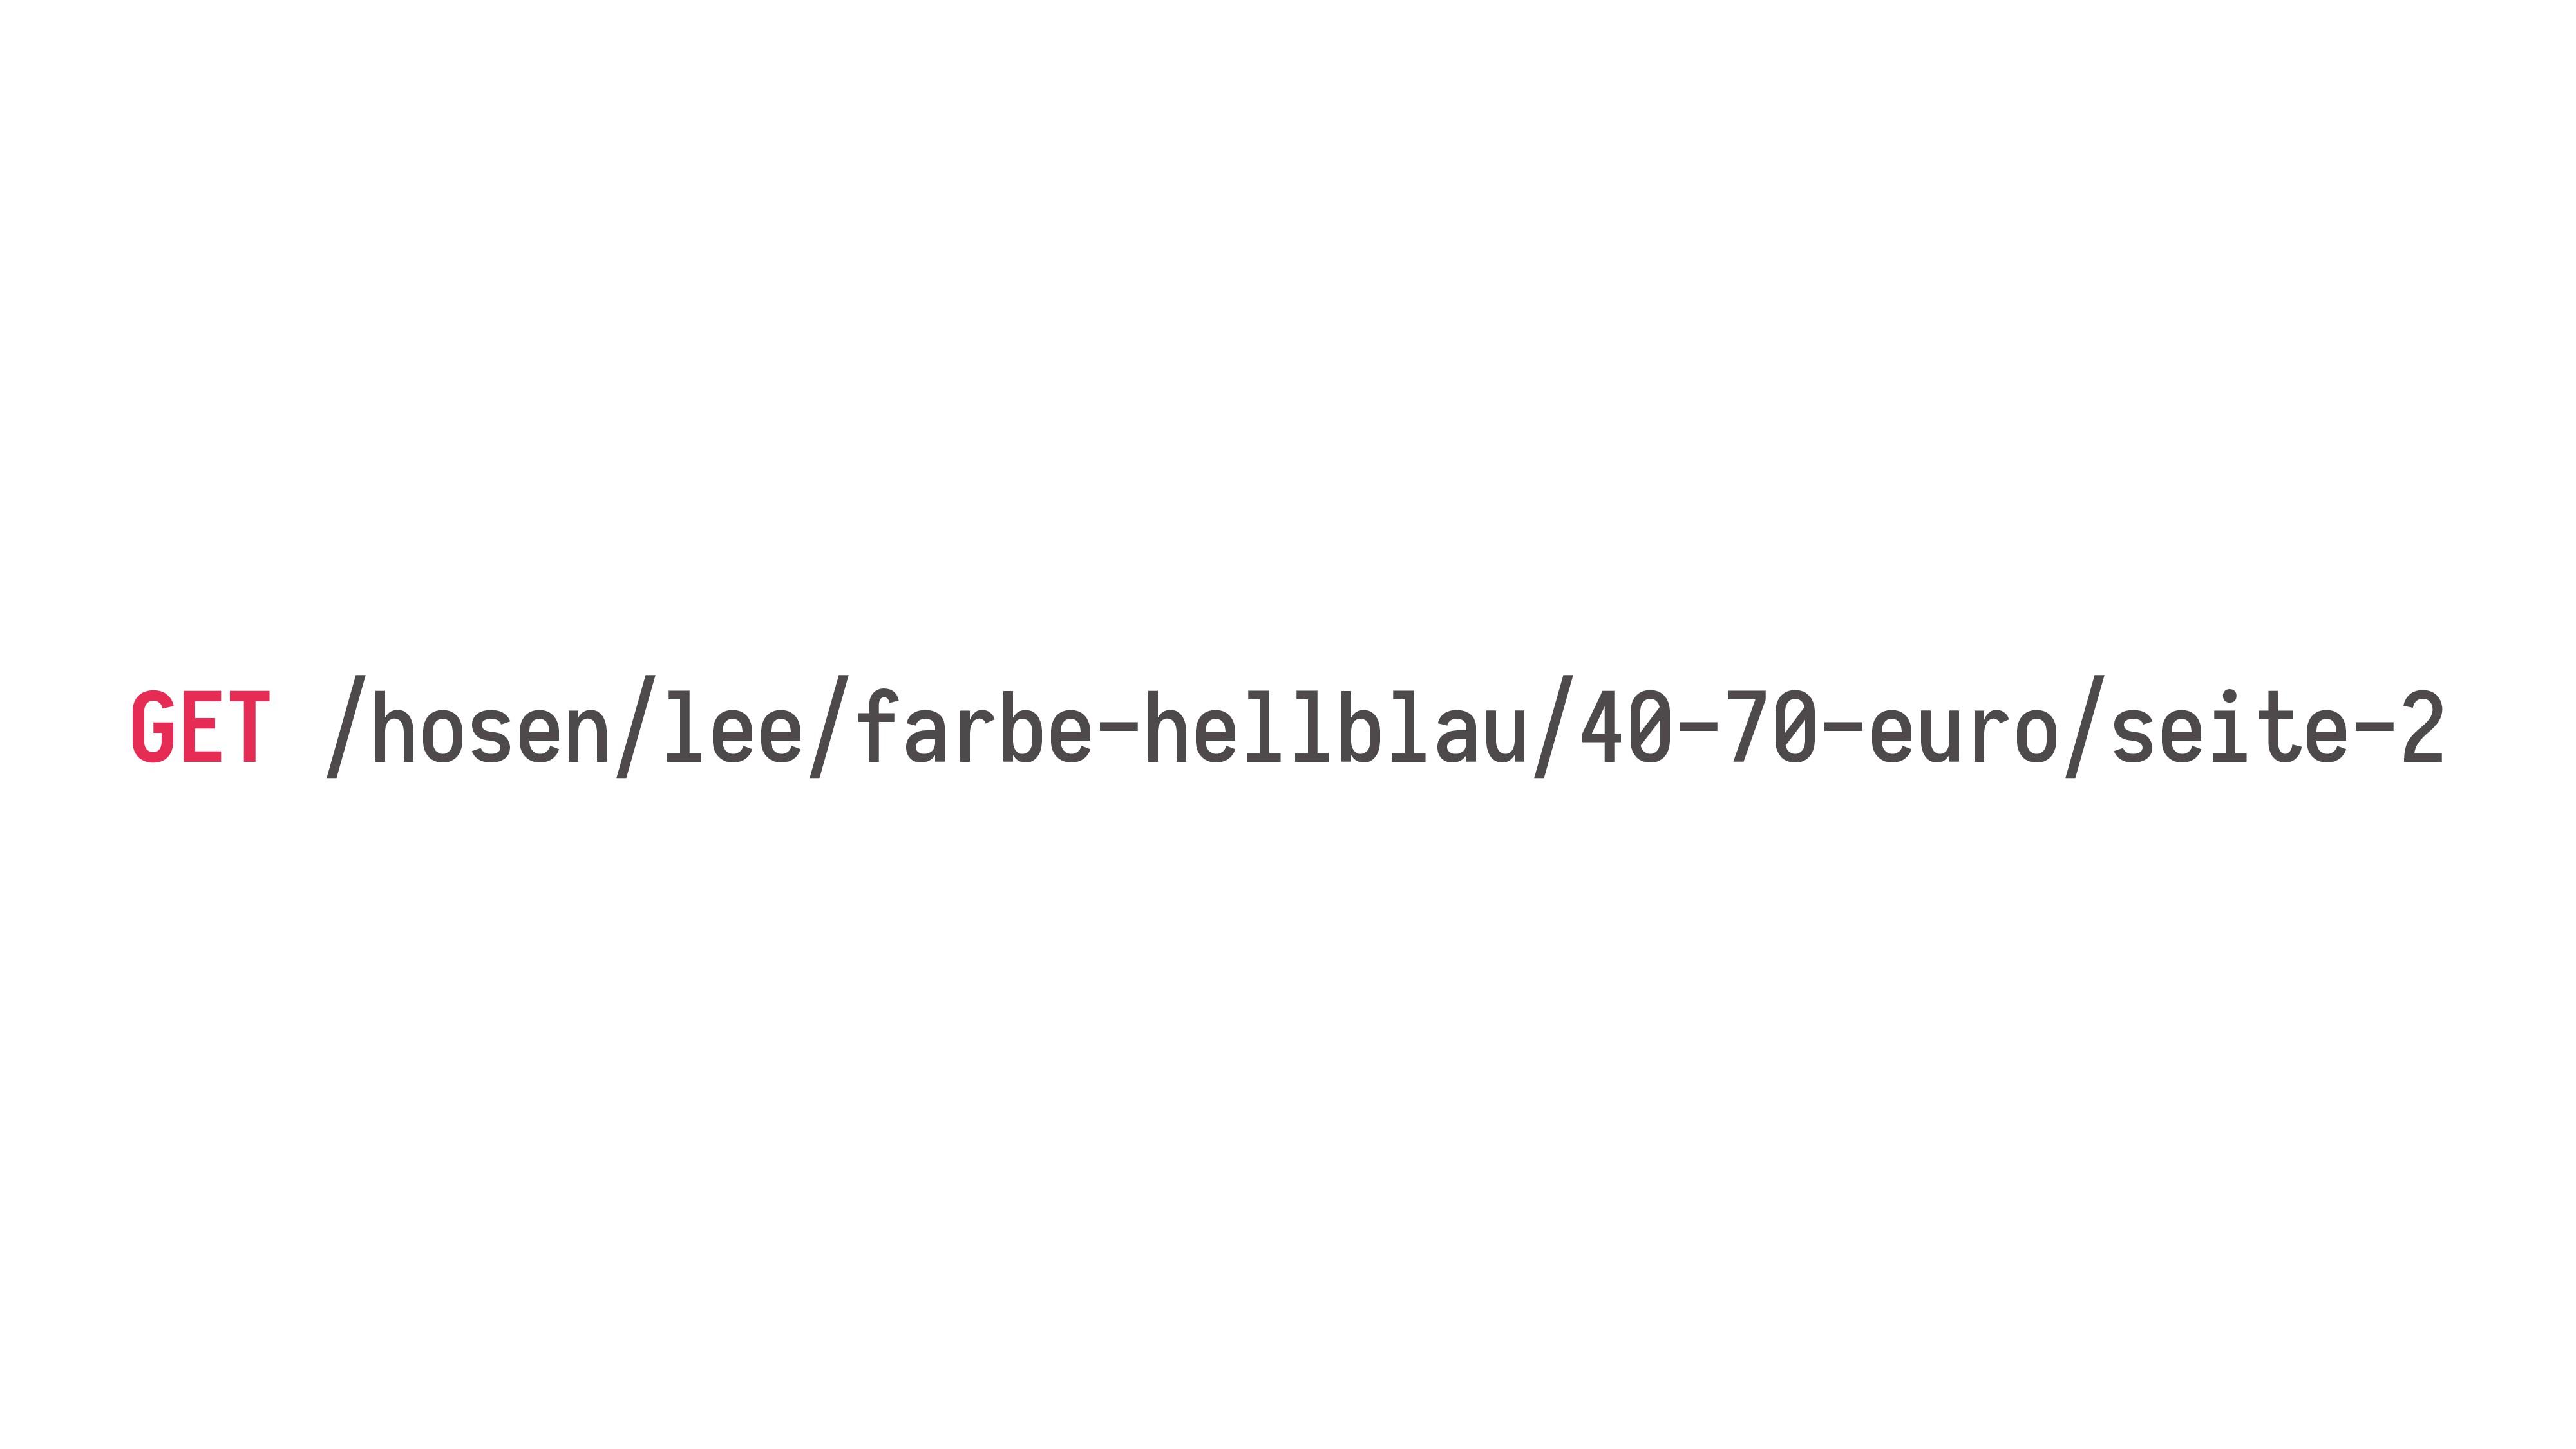 GET /hosen/lee/farbe-hellblau/40-70-euro/seite-2